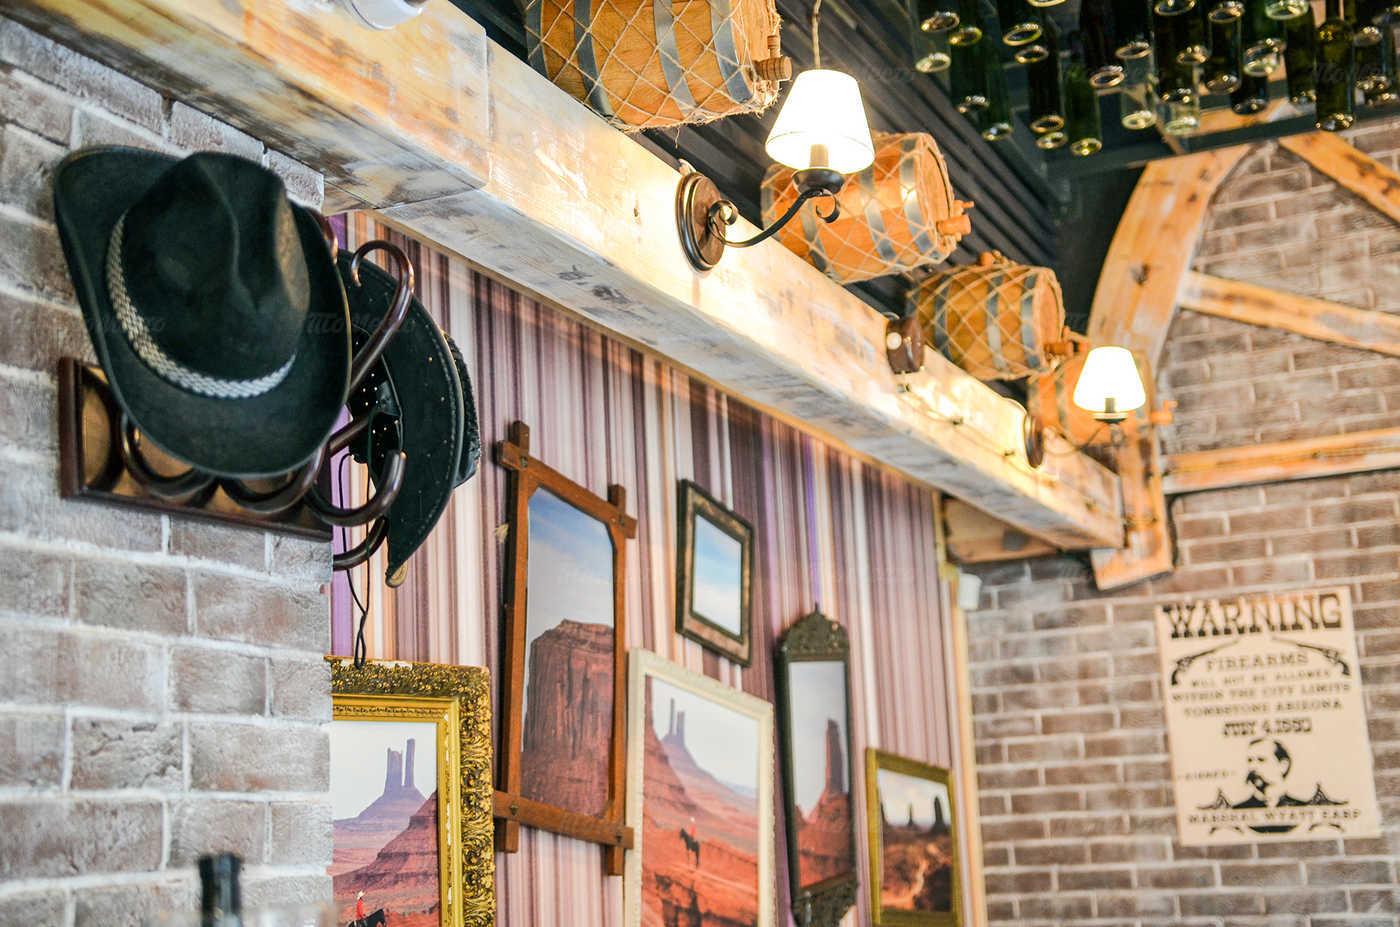 Ресторан Монтана (Montana saloon) на Кирочной улице фото 4